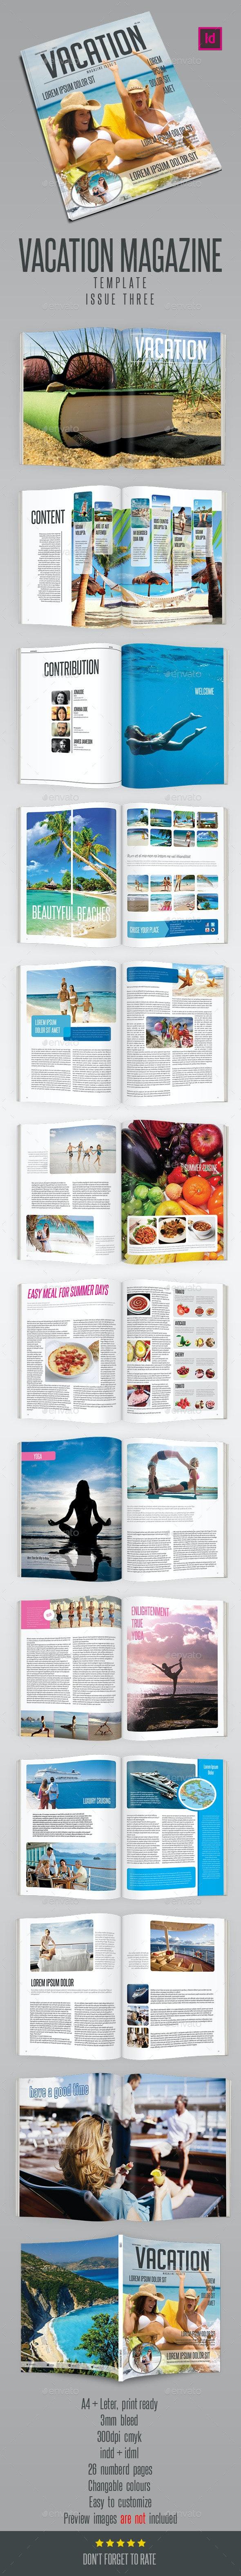 Vacation Magazine Template - Magazines Print Templates